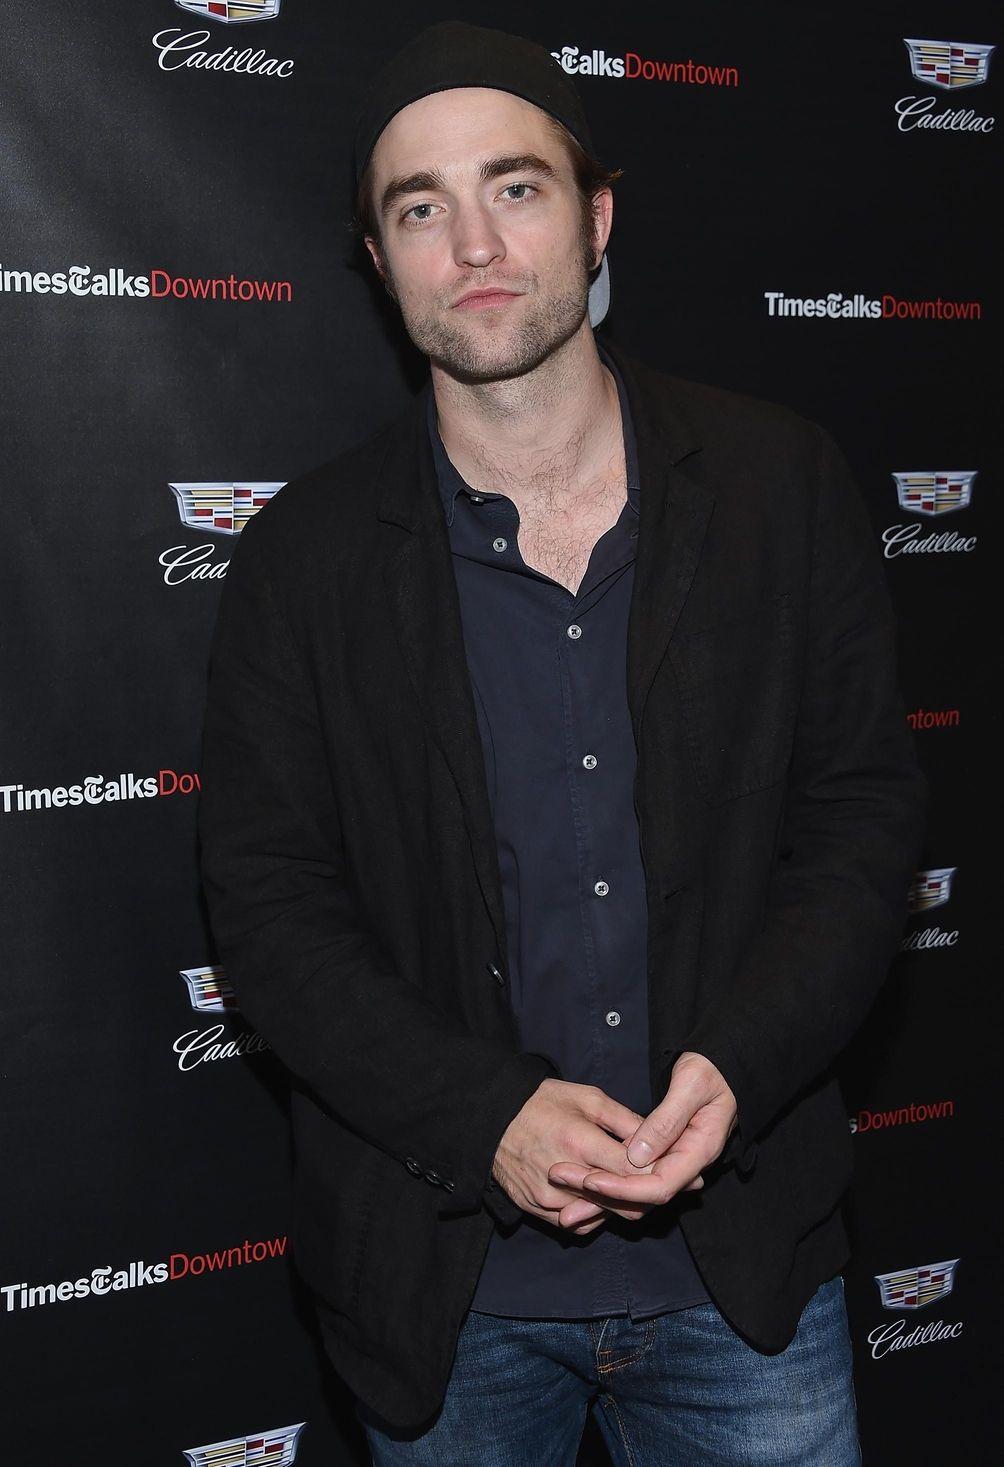 Robert Pattinson attends an event for the film